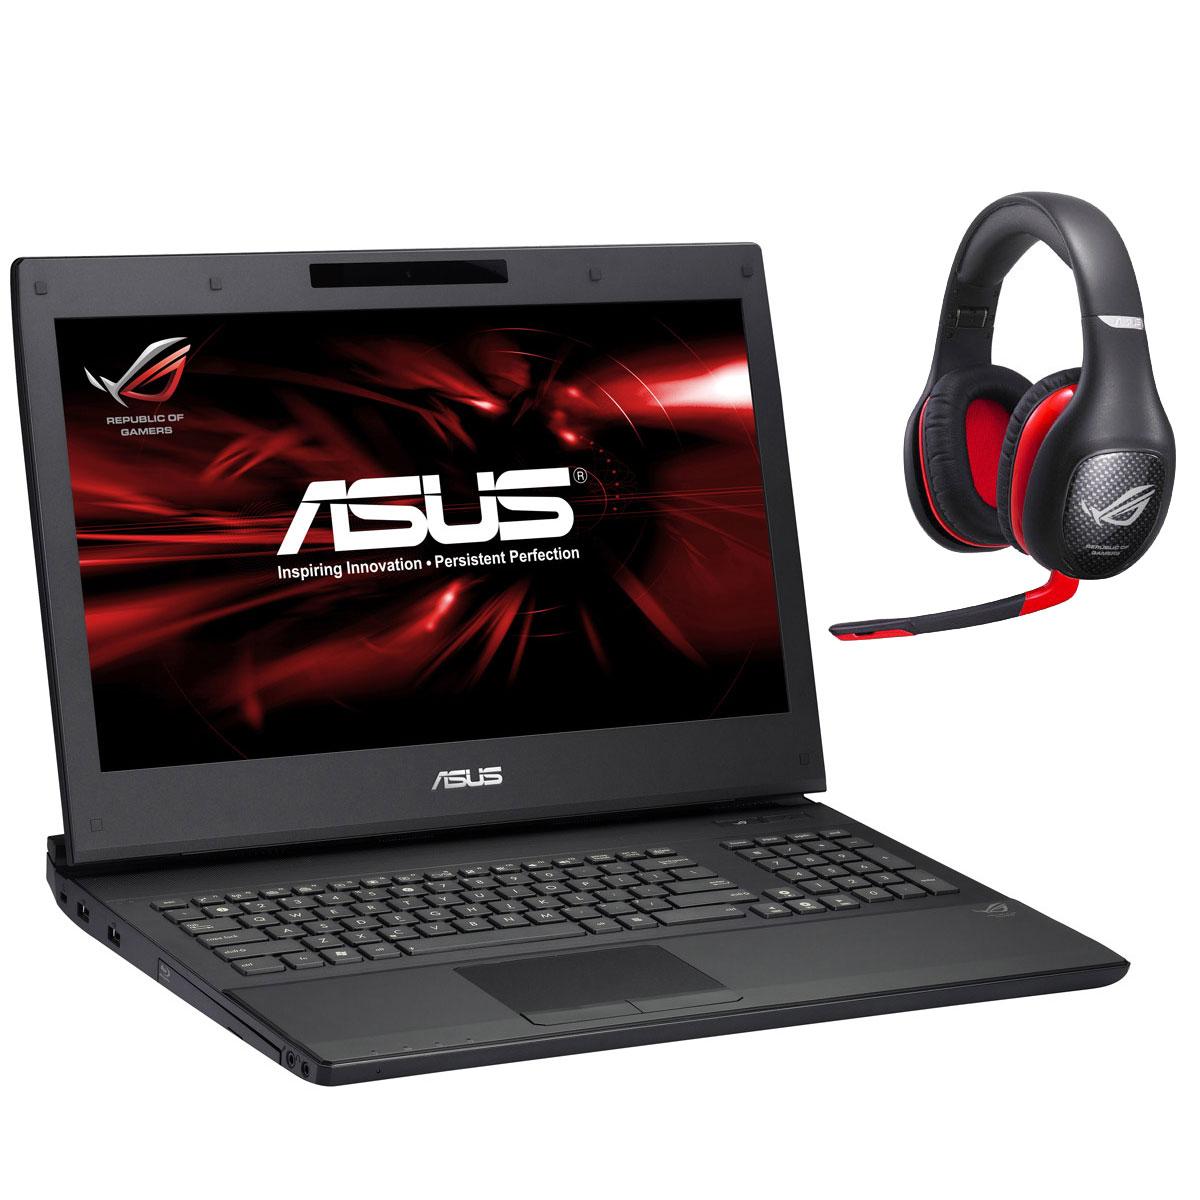 "PC portable ASUS G74SX-TZ378V + ASUS Vulcan ANC Intel Core i7-2670QM 8 Go 750 Go + SSD 256 Go 17.3"" LED NVIDIA GeForce GTX 560M Graveur DVD Wi-Fi N/BT Webcam Windows 7 Premium 64 bits (garantie constructeur 2 ans)"